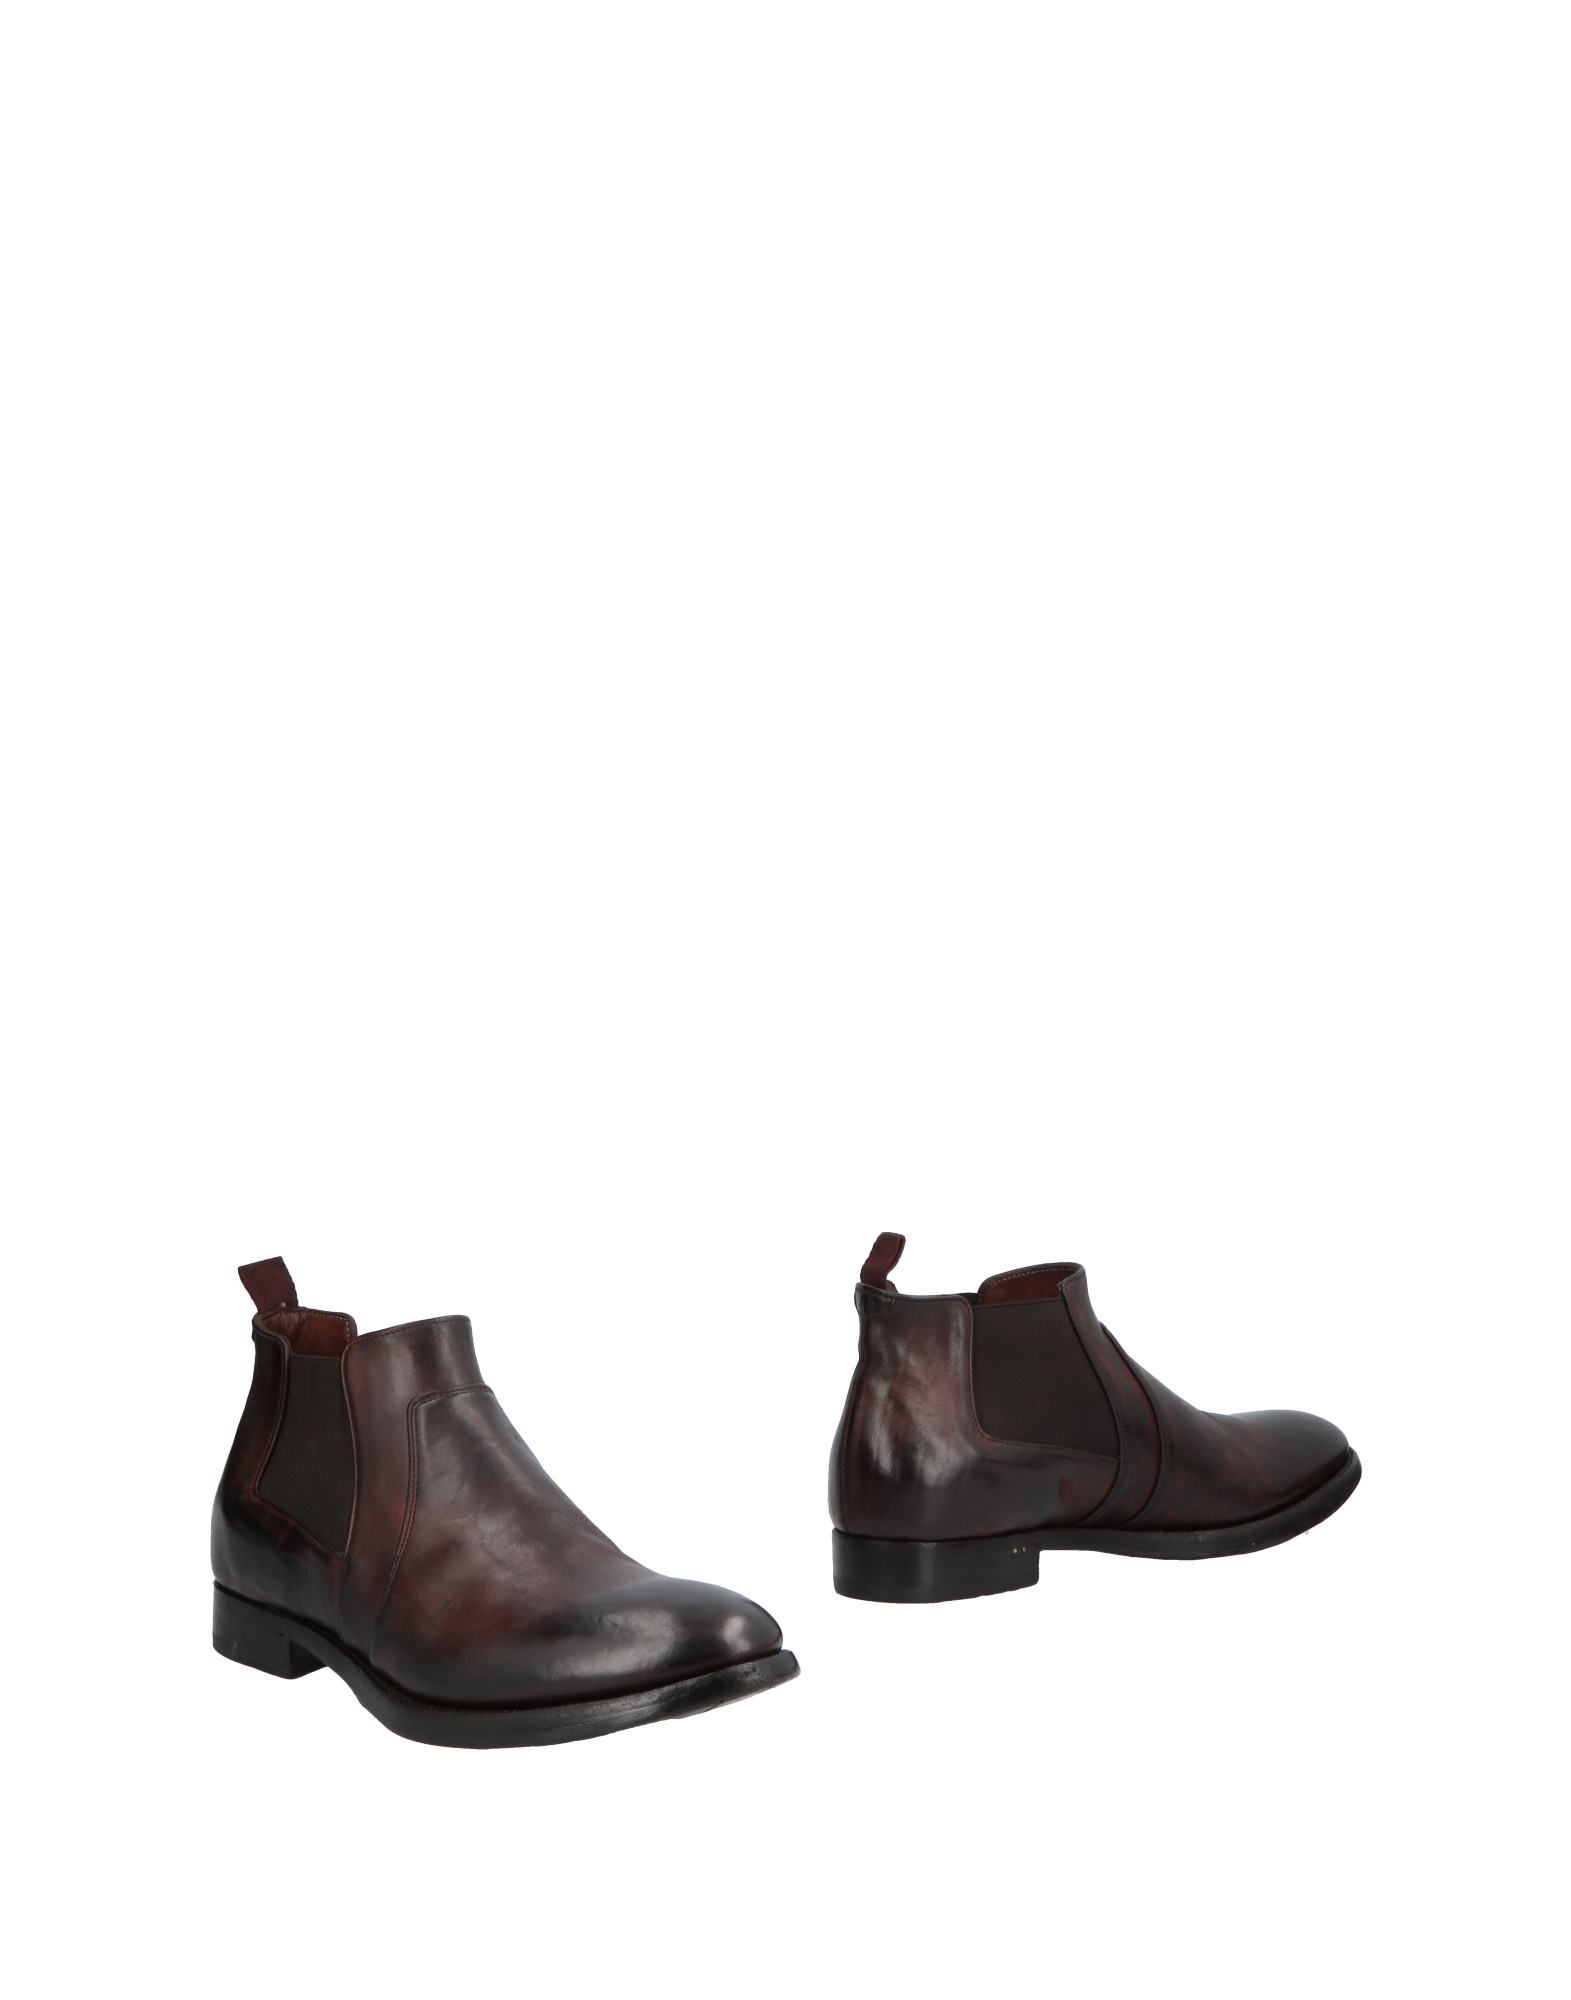 Silvano Sassetti Boots Boots - Men Silvano Sassetti Boots Boots online on  United Kingdom - 11505550QP d716f2